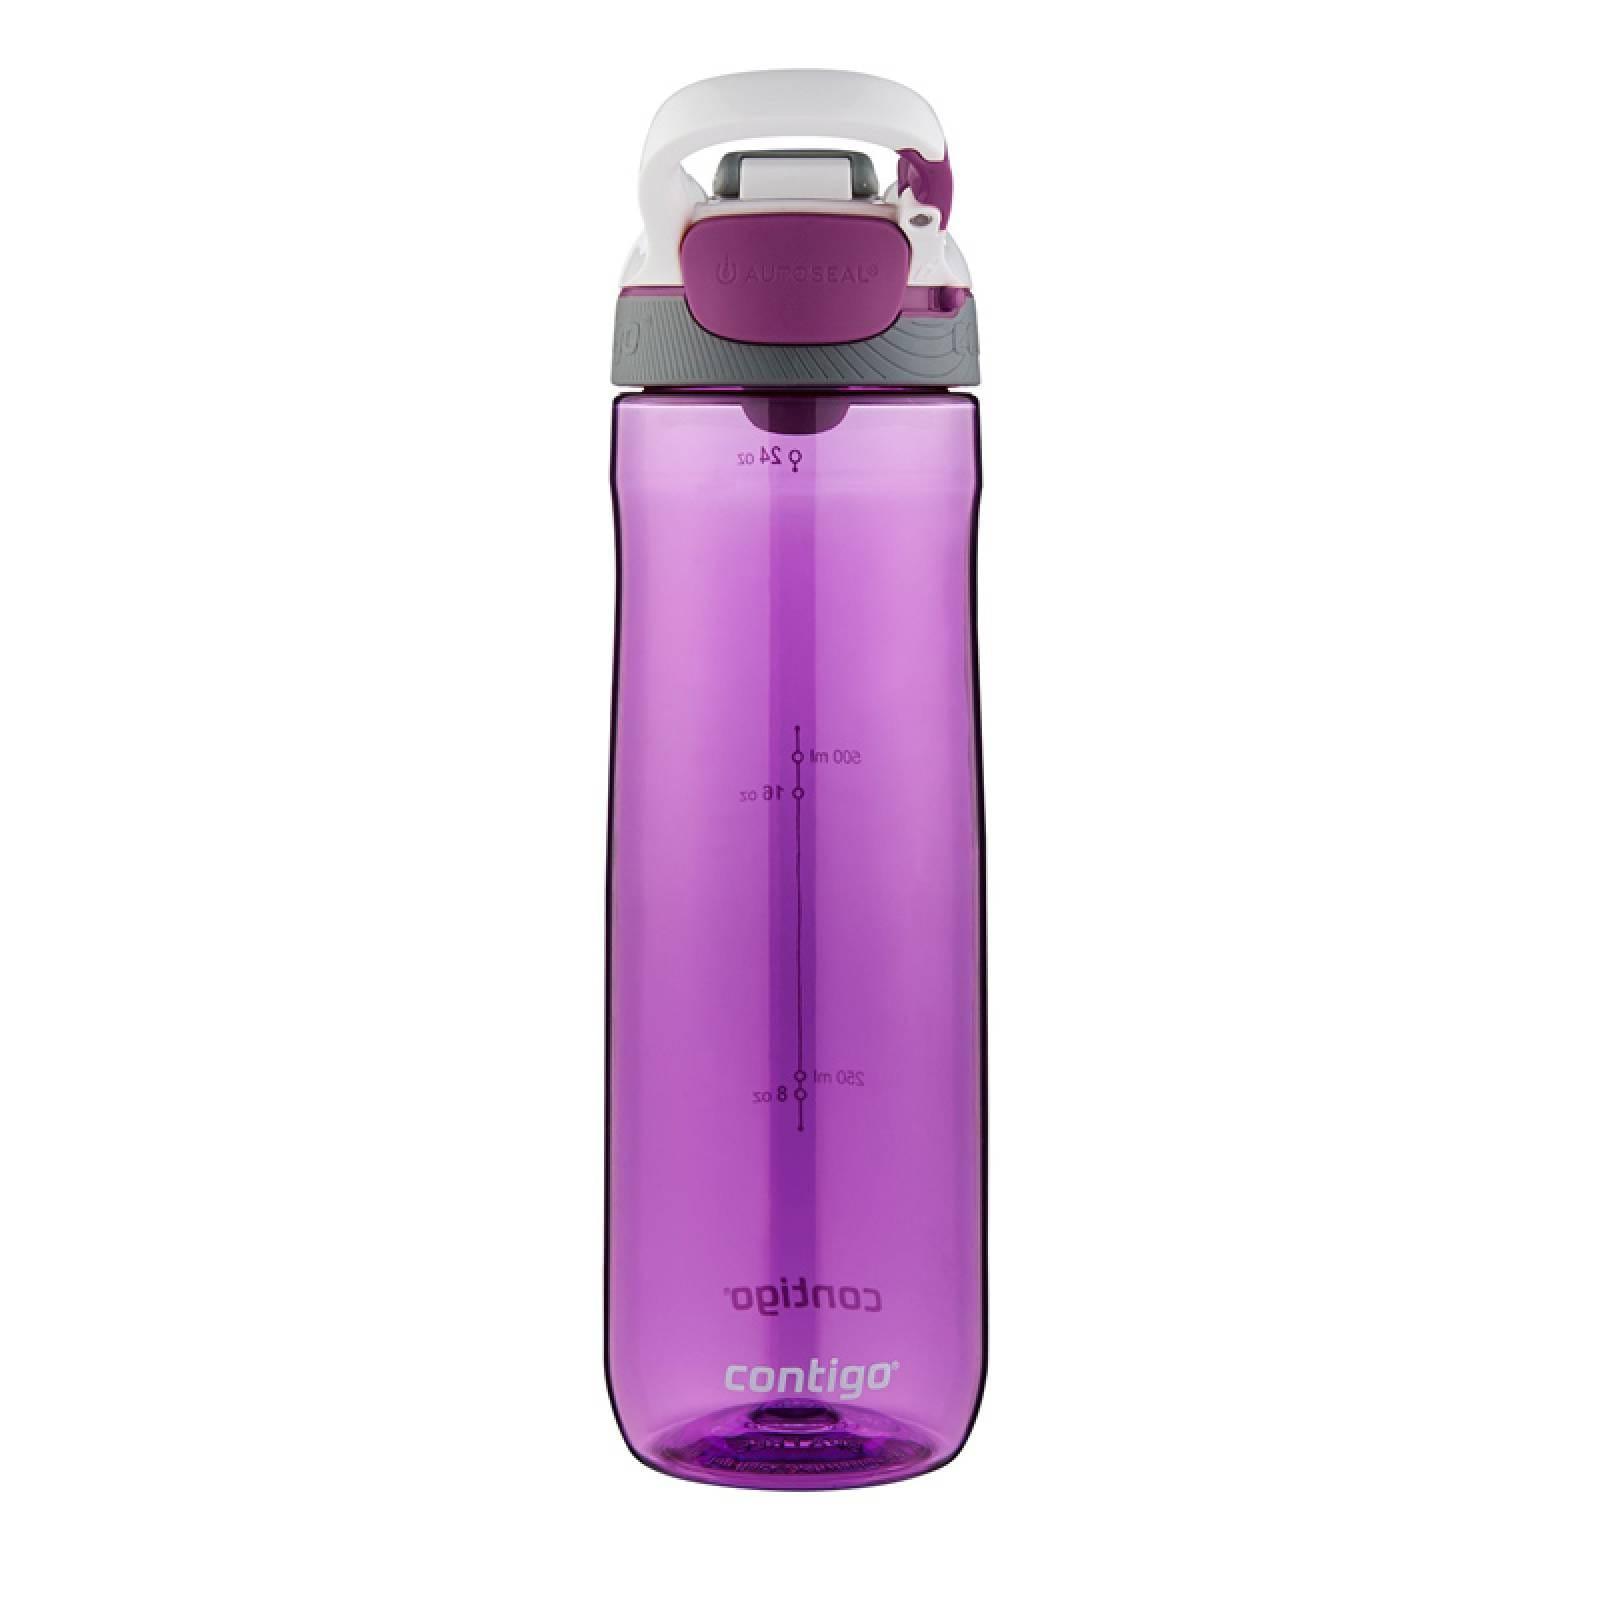 Botella Plastica 24 Oz Sistema Autoseal Cortland Morado Orquidea Contigo